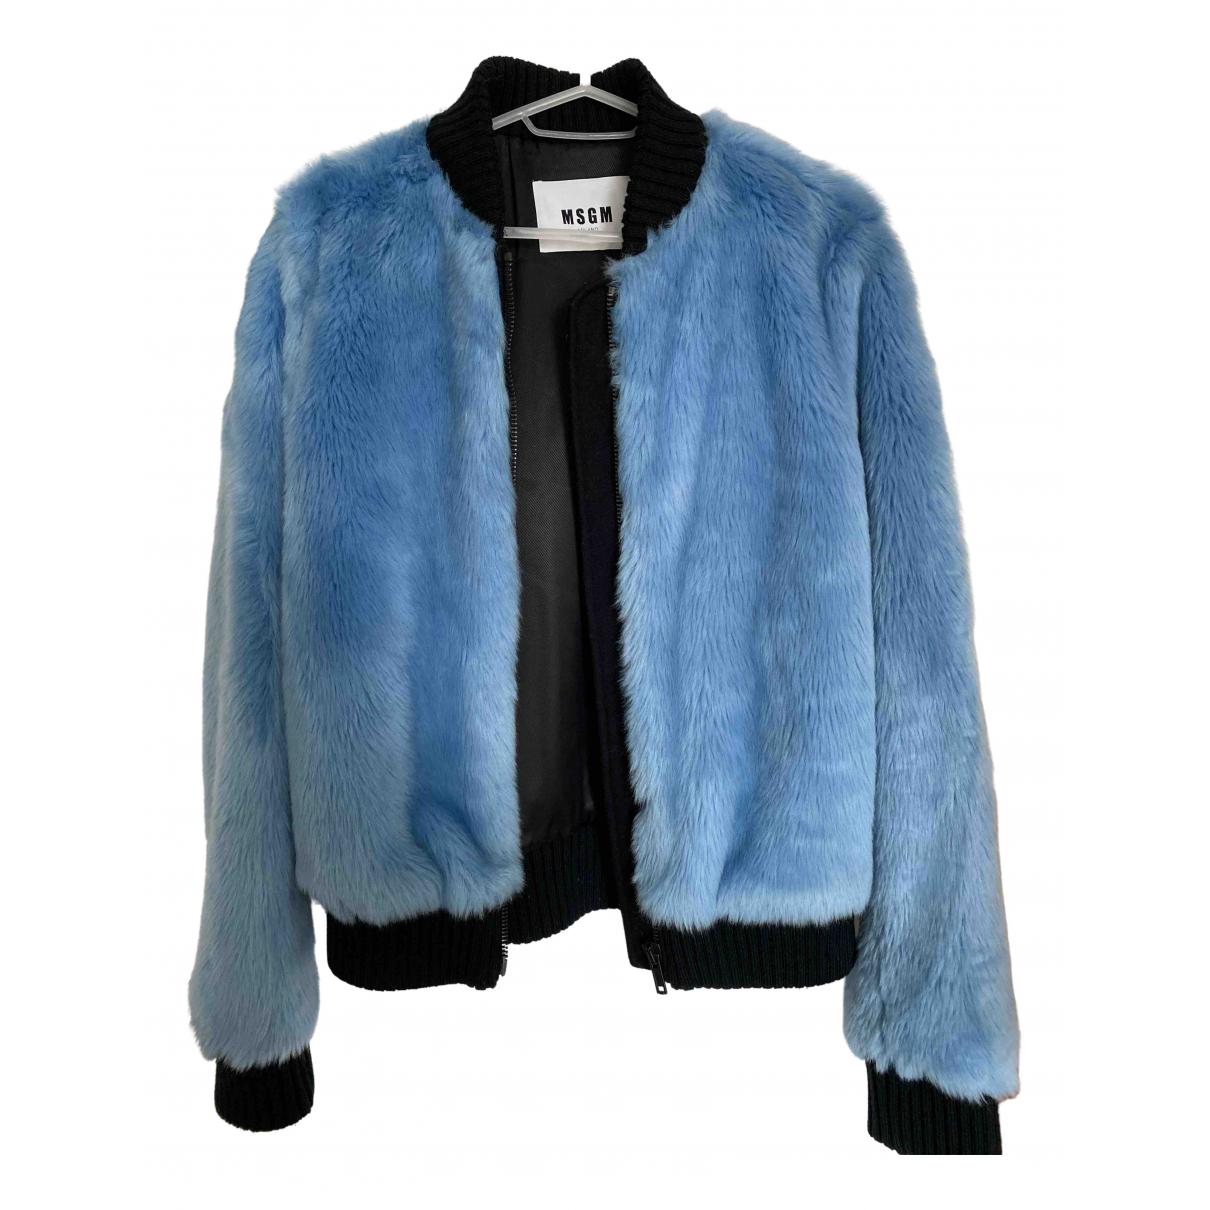 Msgm \N Blue Faux fur jacket for Women 8 UK